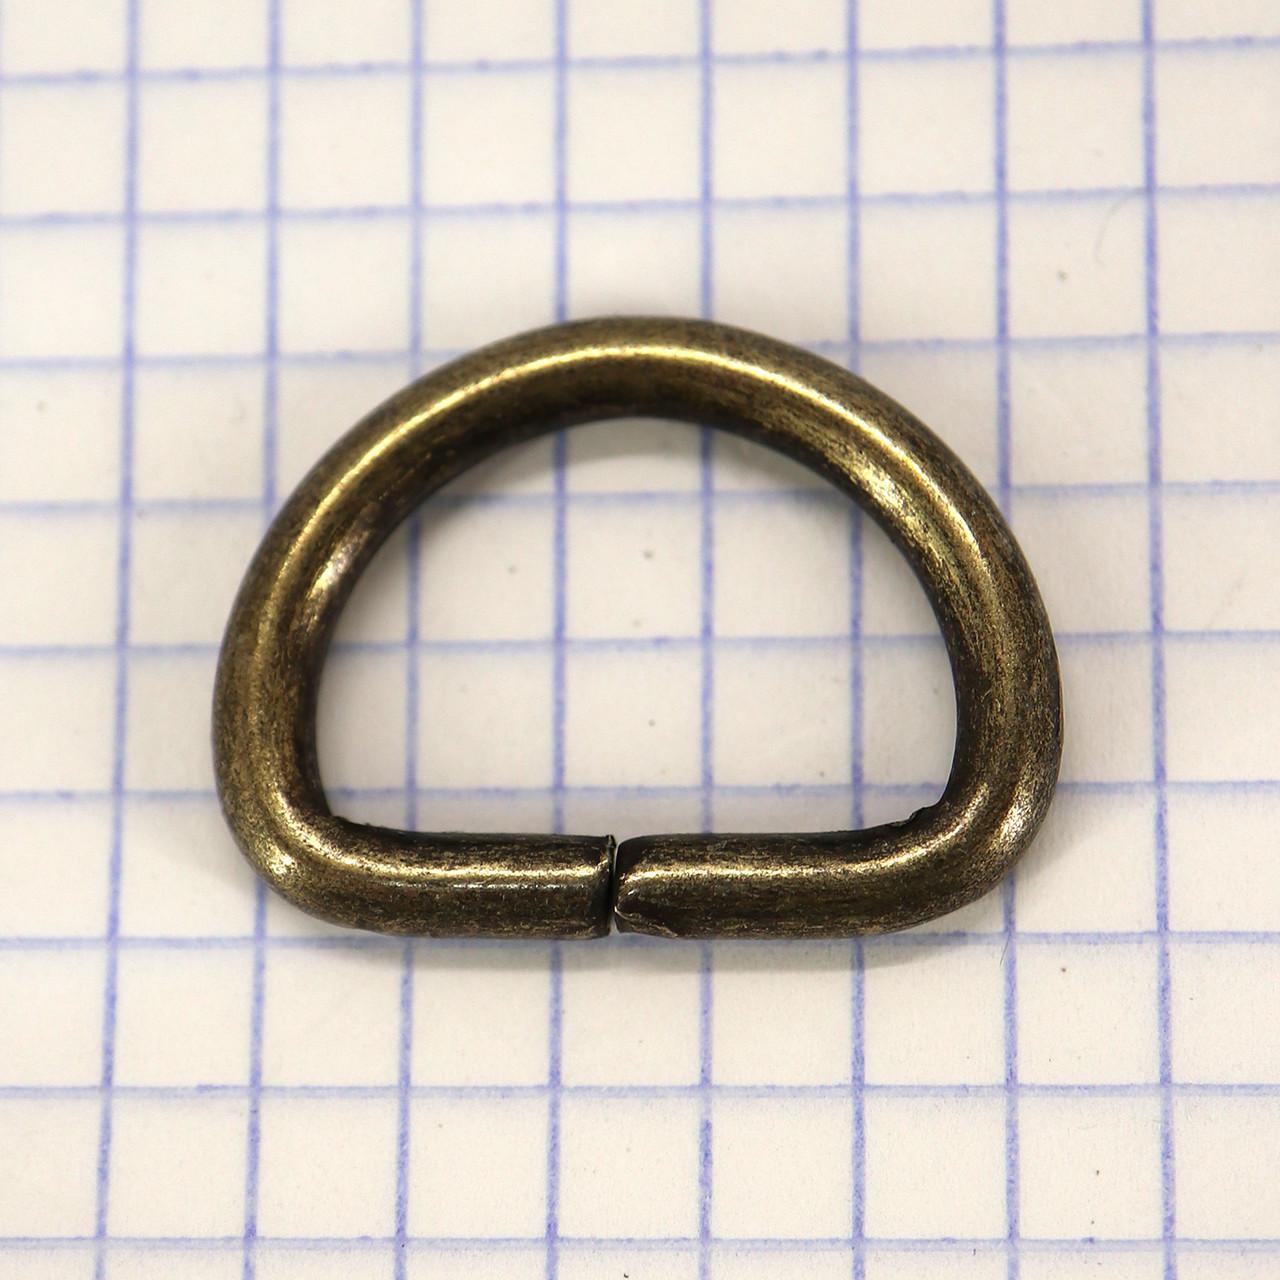 Полукольцо 20 мм антик 20*14*3,5 для сумок t4232 (40 шт.)